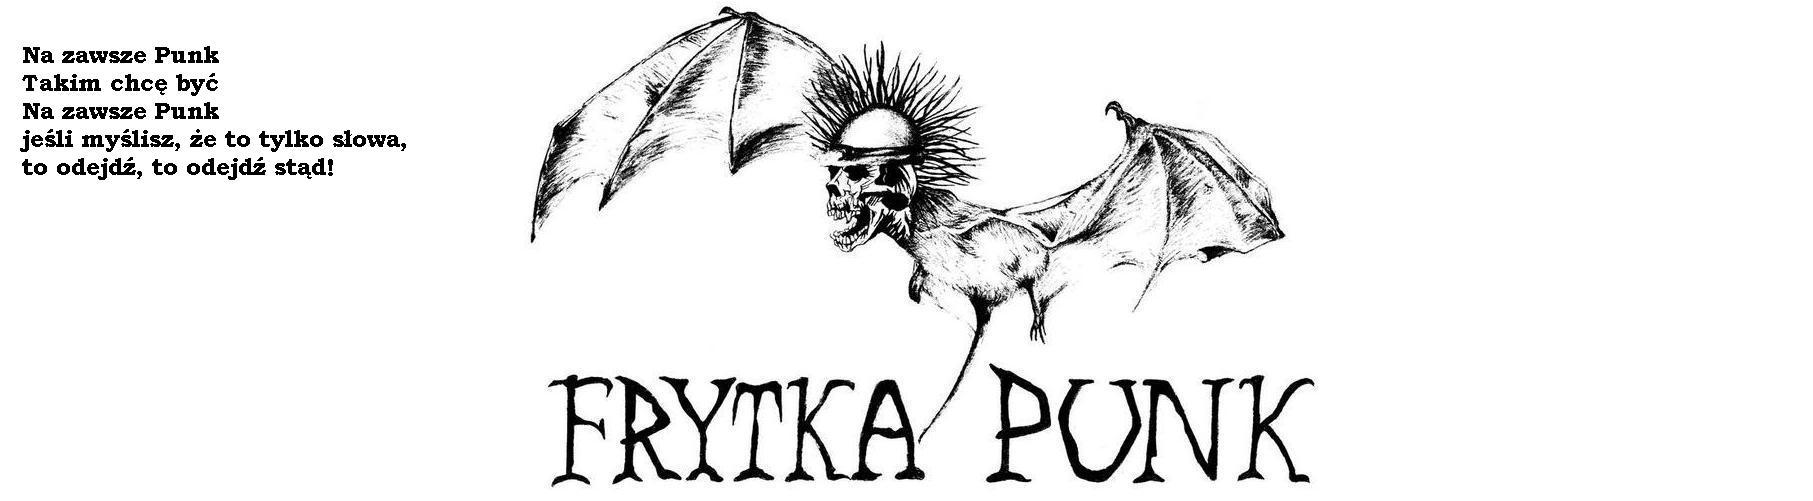 www.frytkapunk.pl